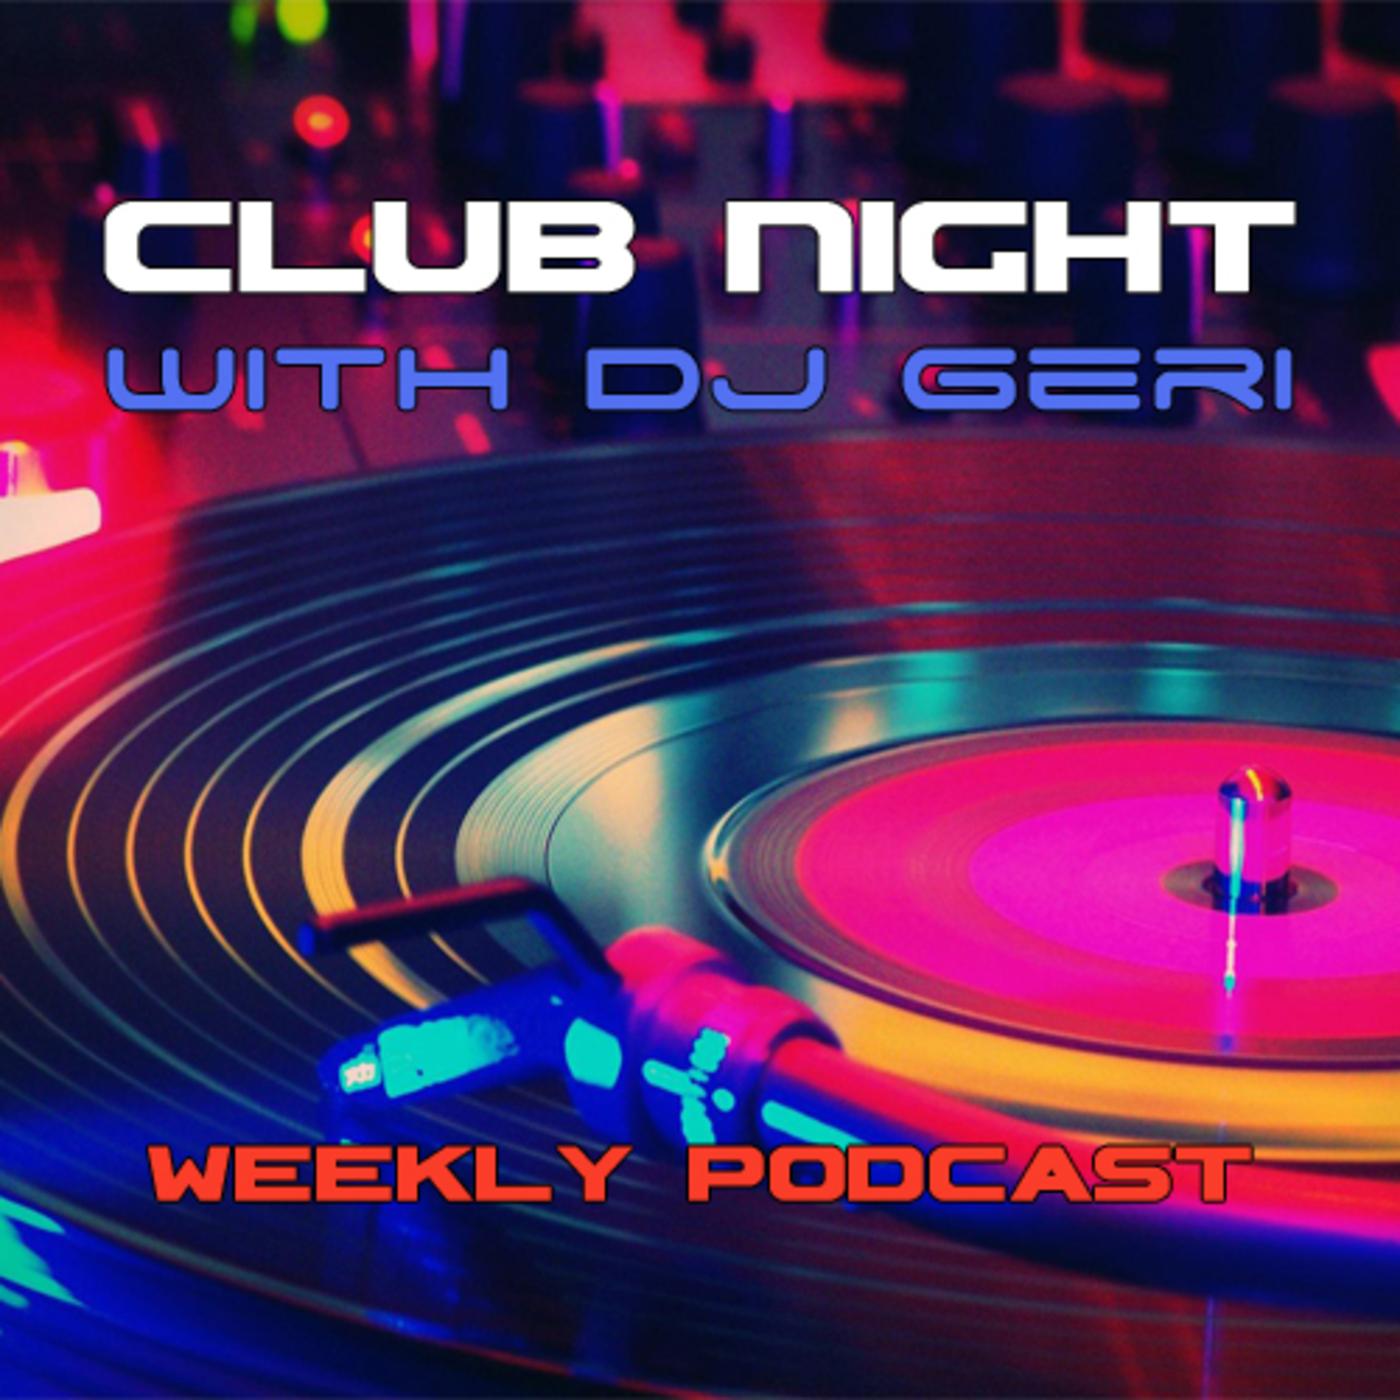 Club Night With DJ Geri 611 Club Night With DJ Geri podcast